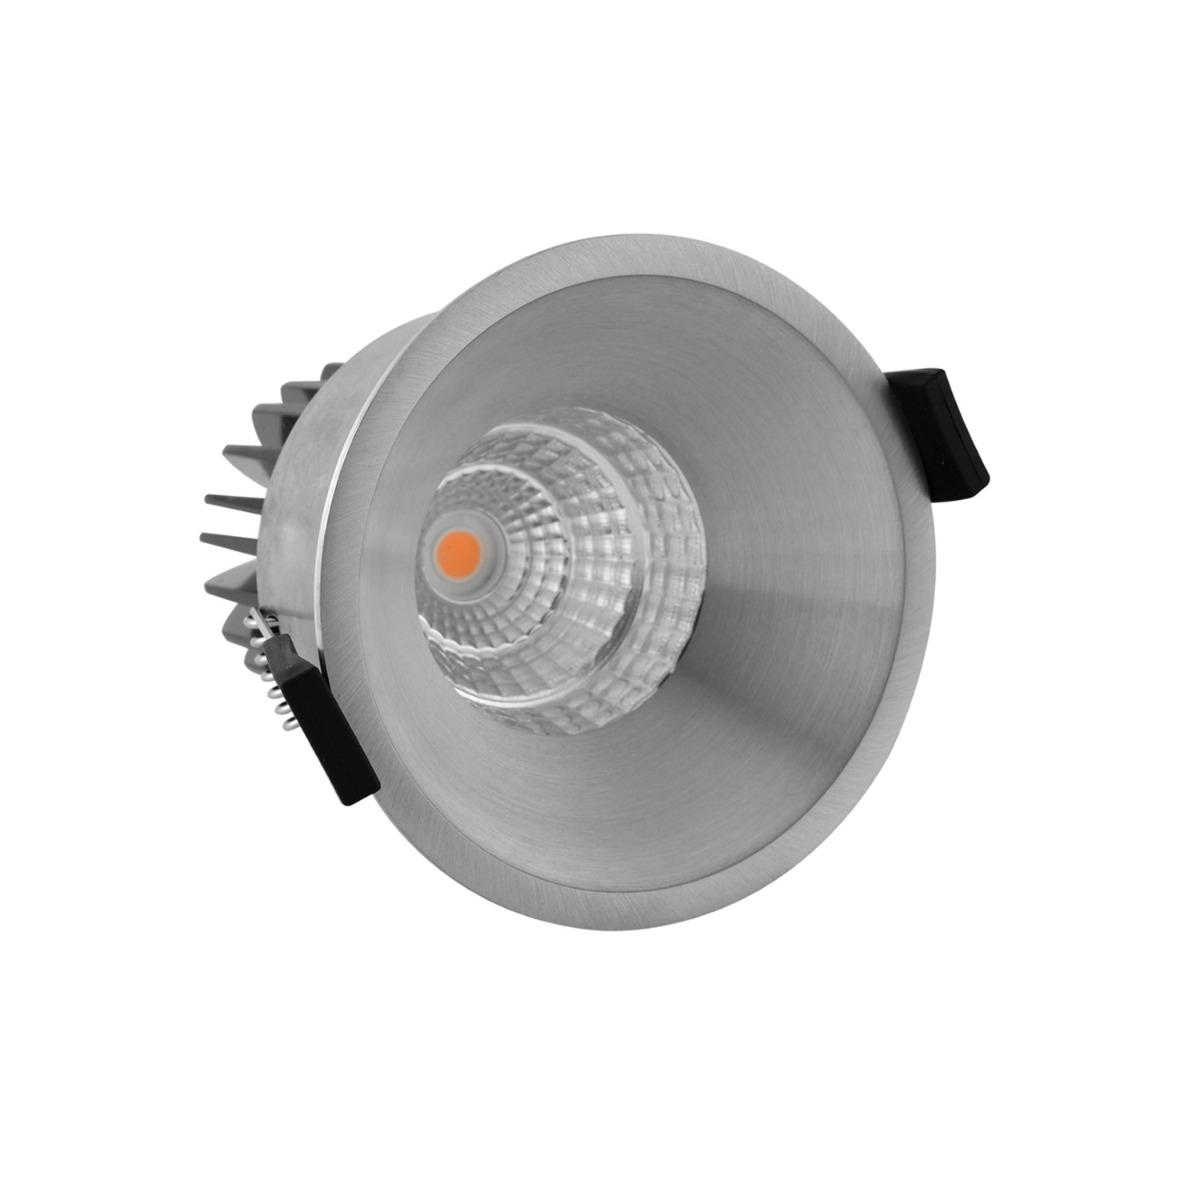 Noxion LED Spot Starlight IP54 2700K Aluminium 6W   Beste Kleurweergave - Dimbaar